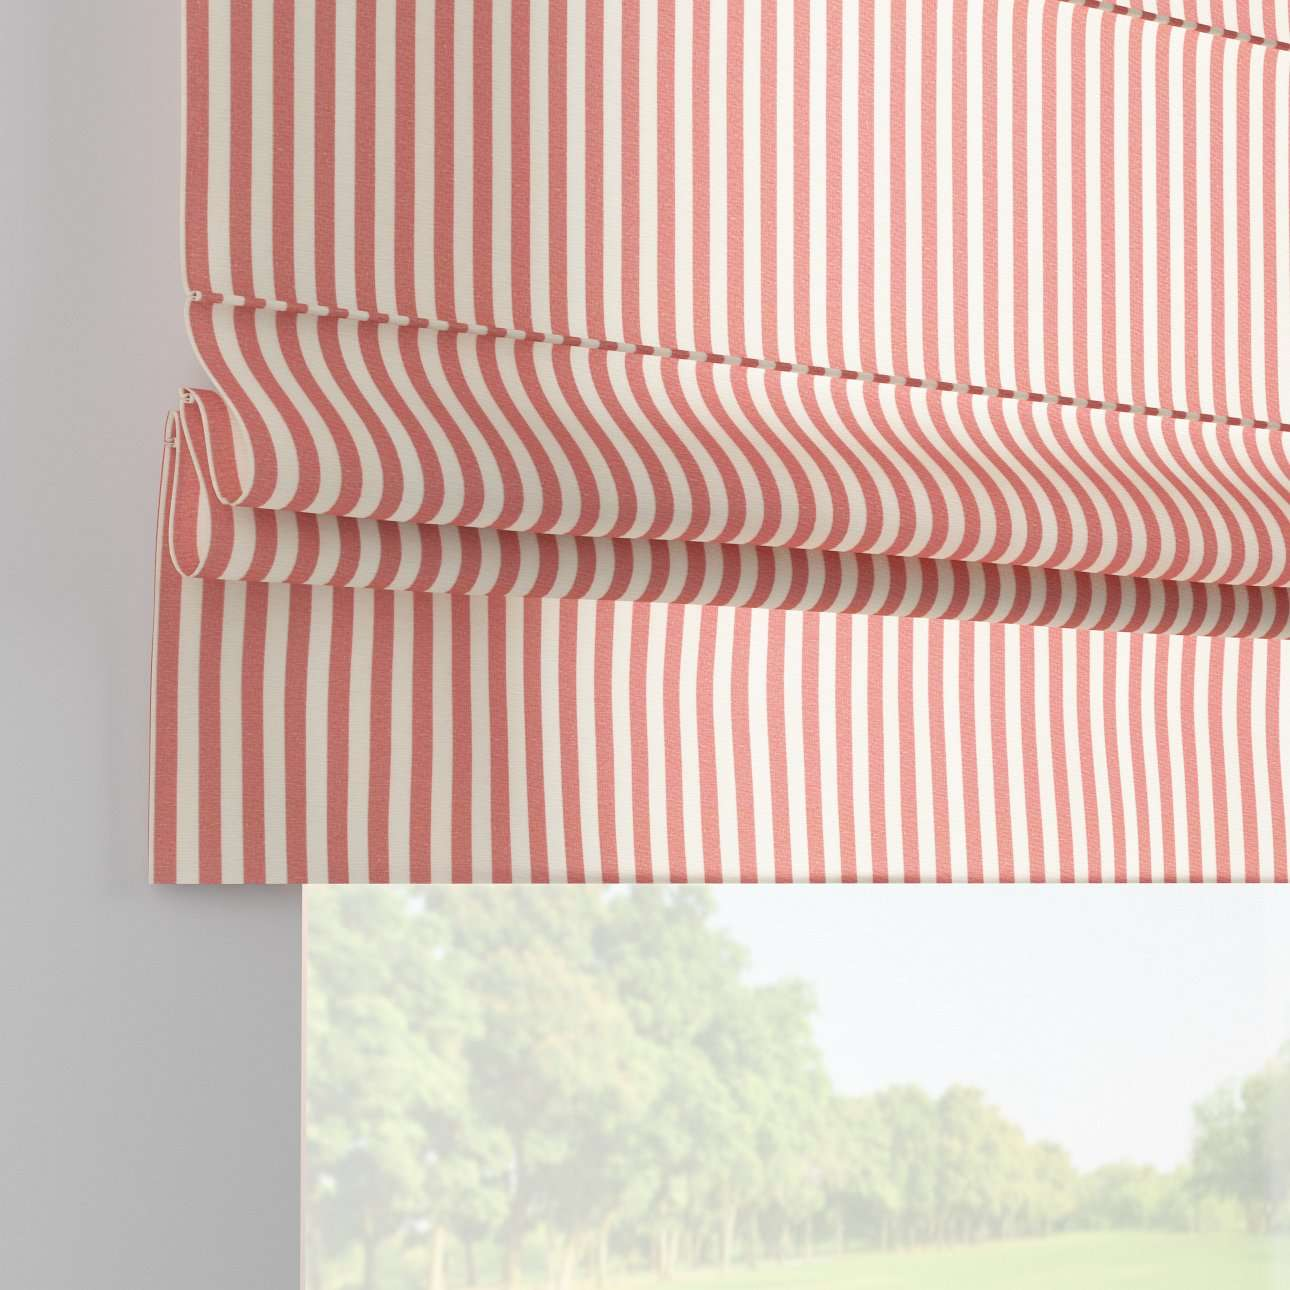 vouwgordijn Padva 80 × 170 cm van de collectie Quadro, Stof: 136-17